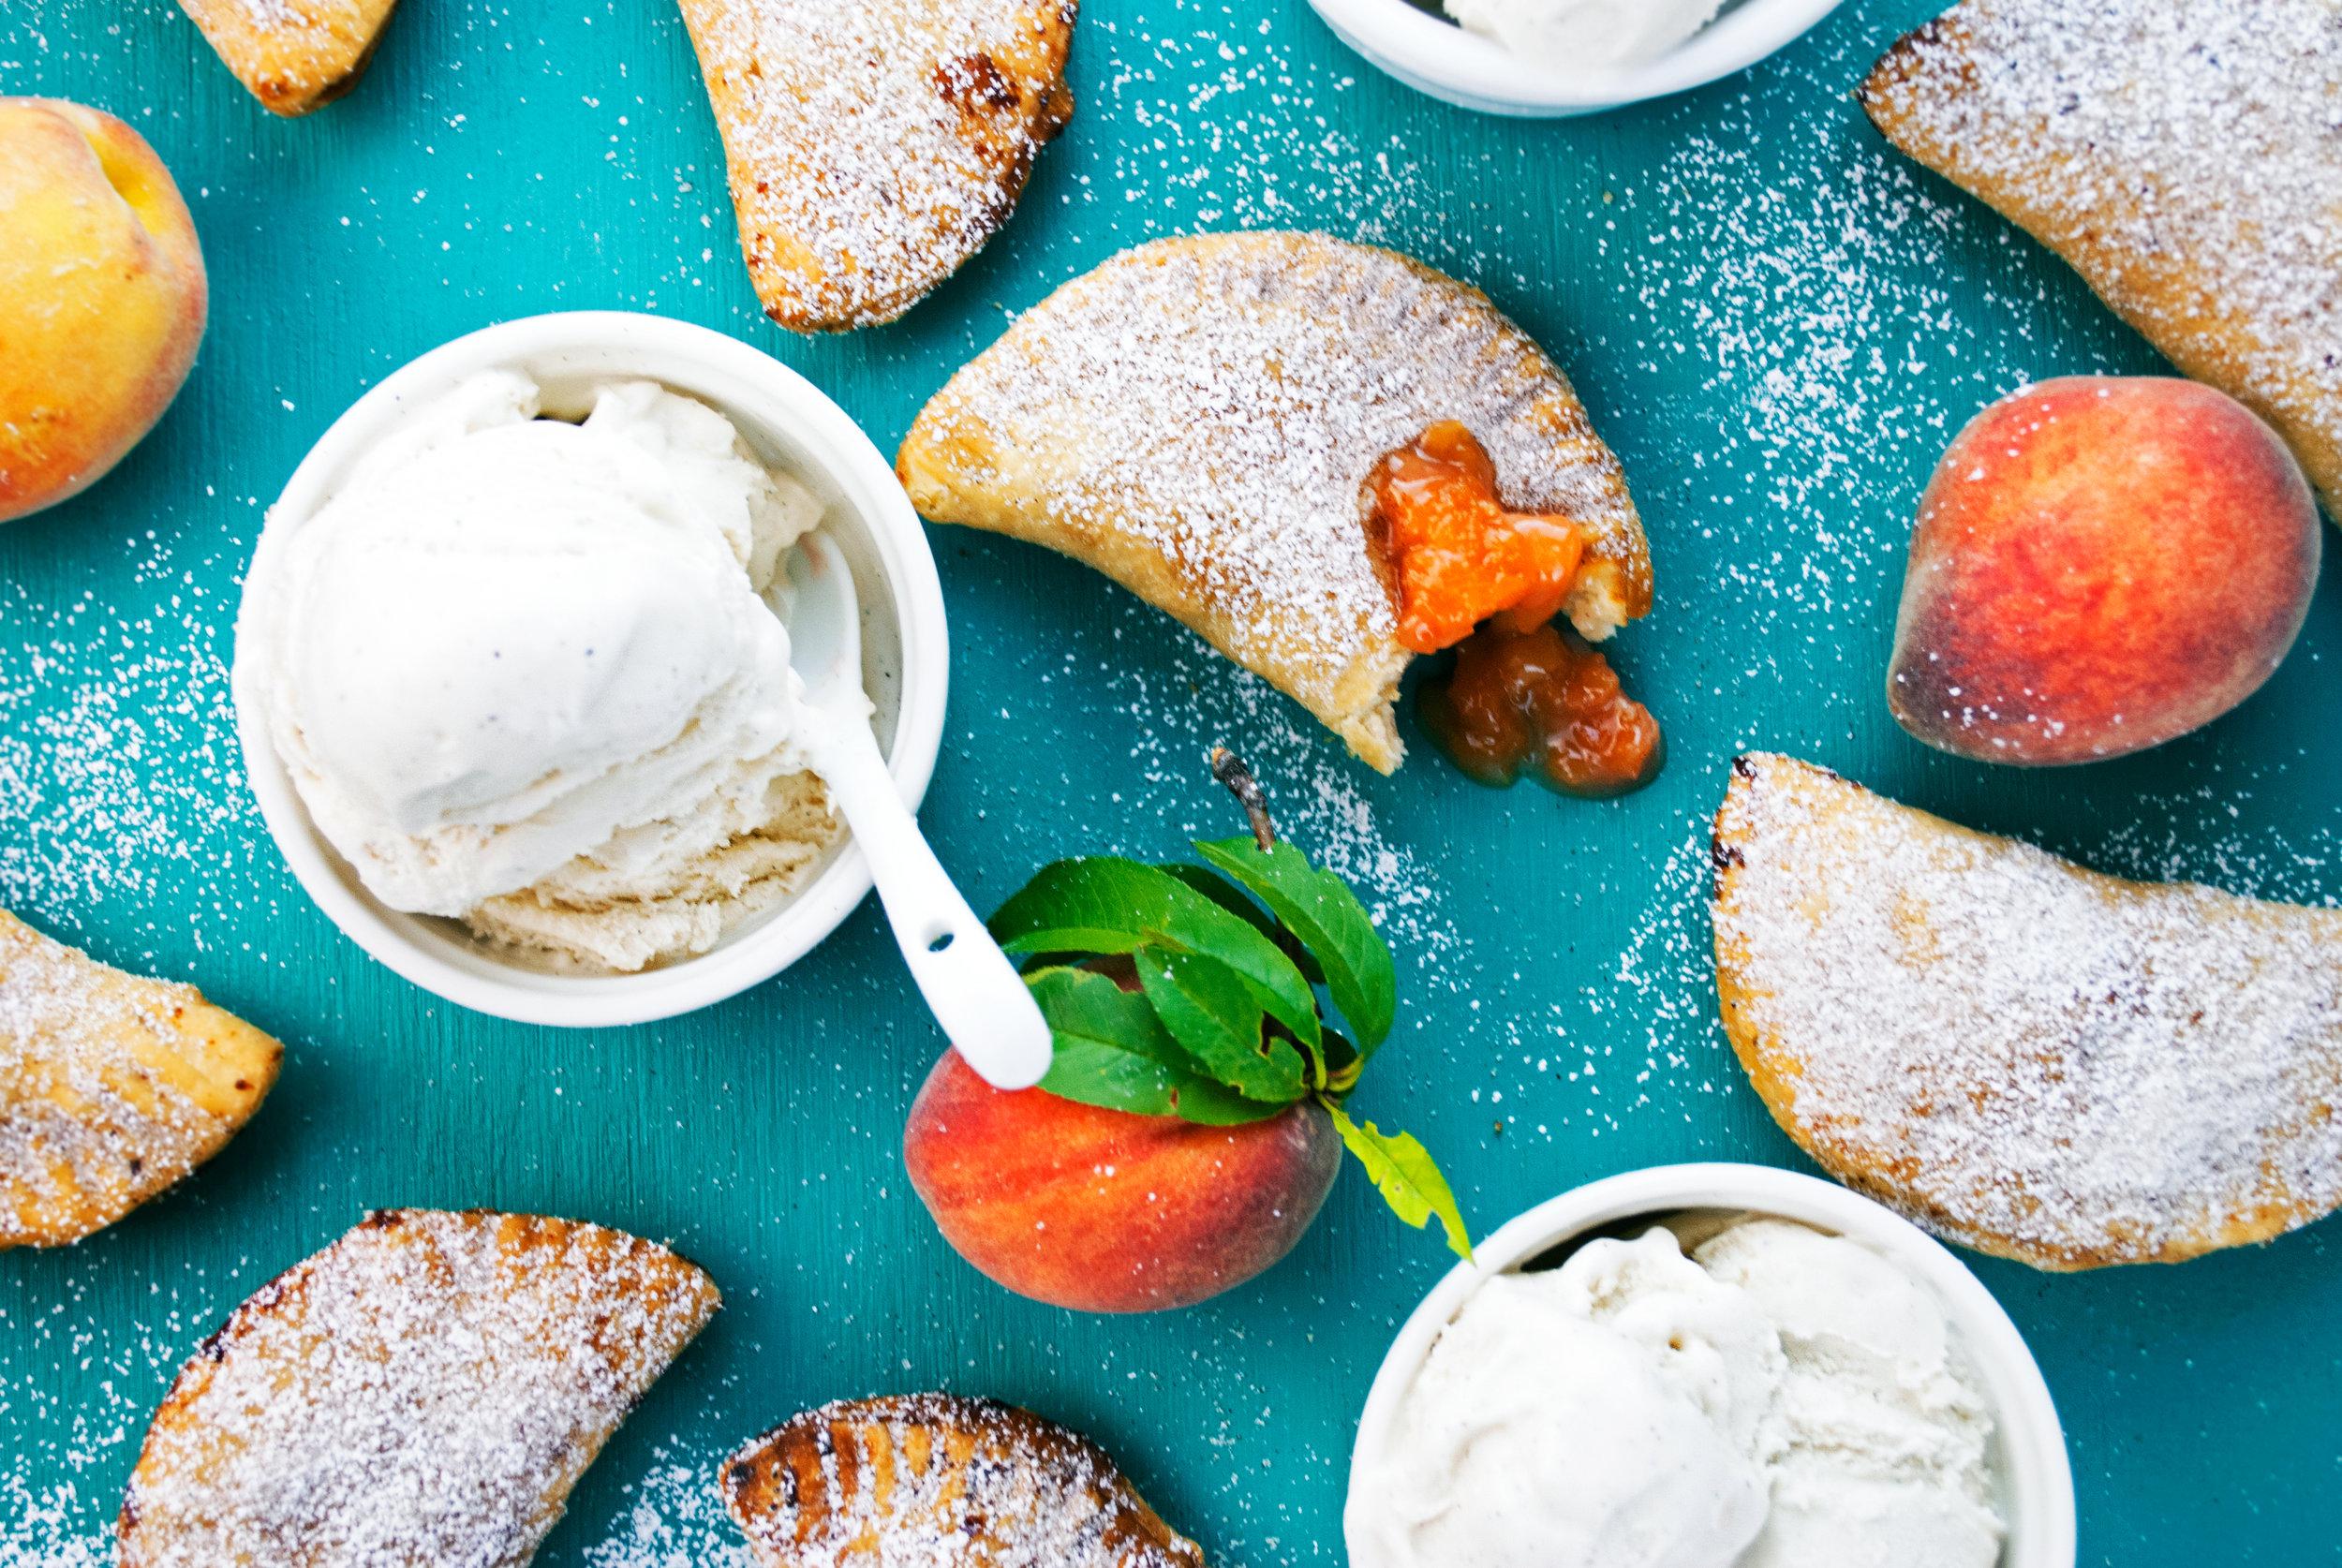 fried peach hands pies 2.jpg